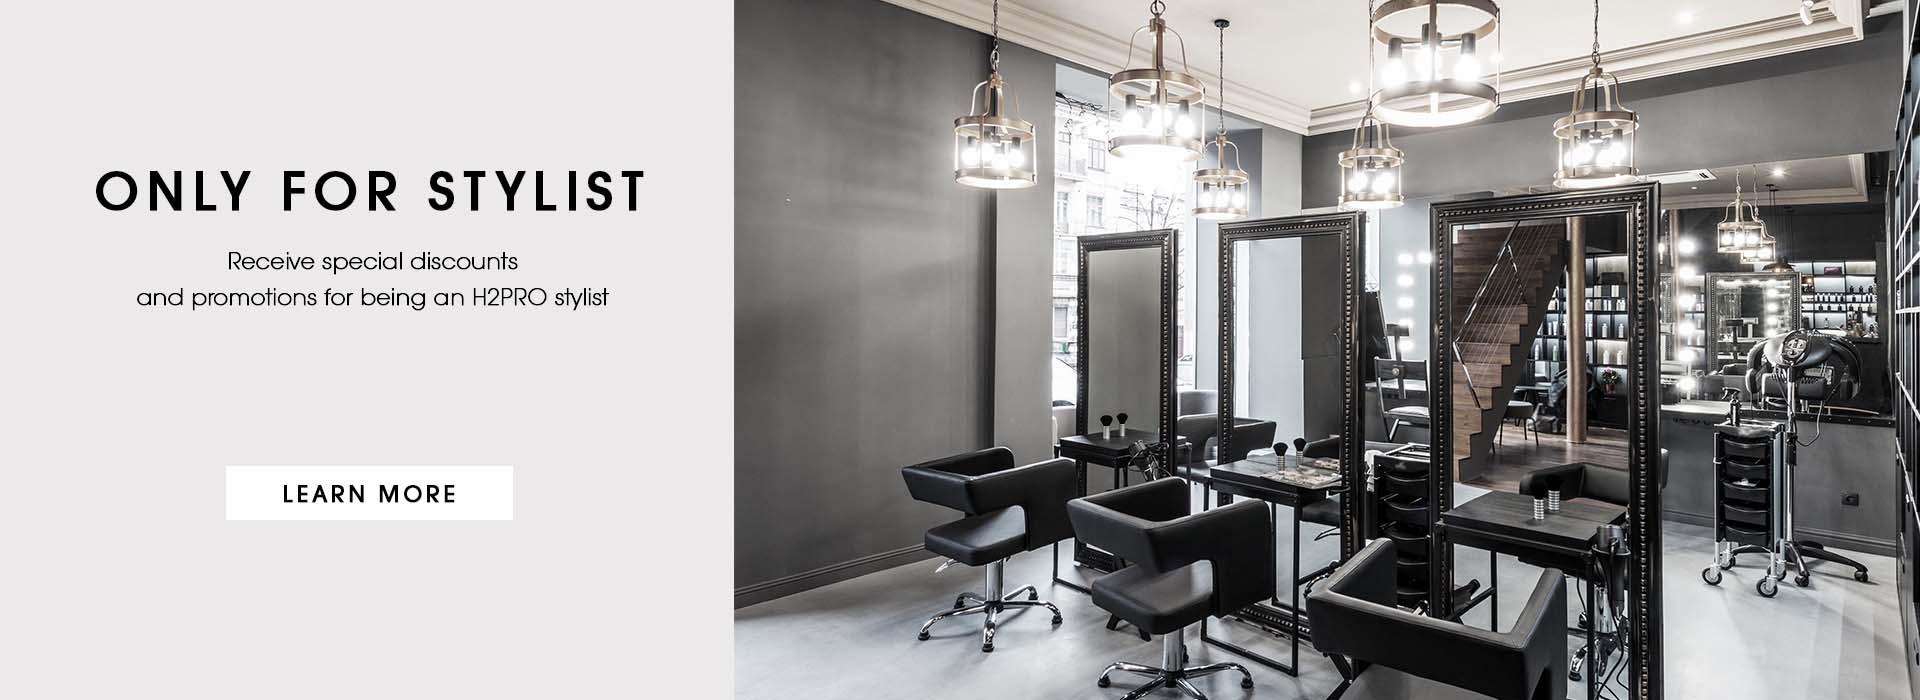 Hair Stylists, Professional Straightener - H2pro Beautylife